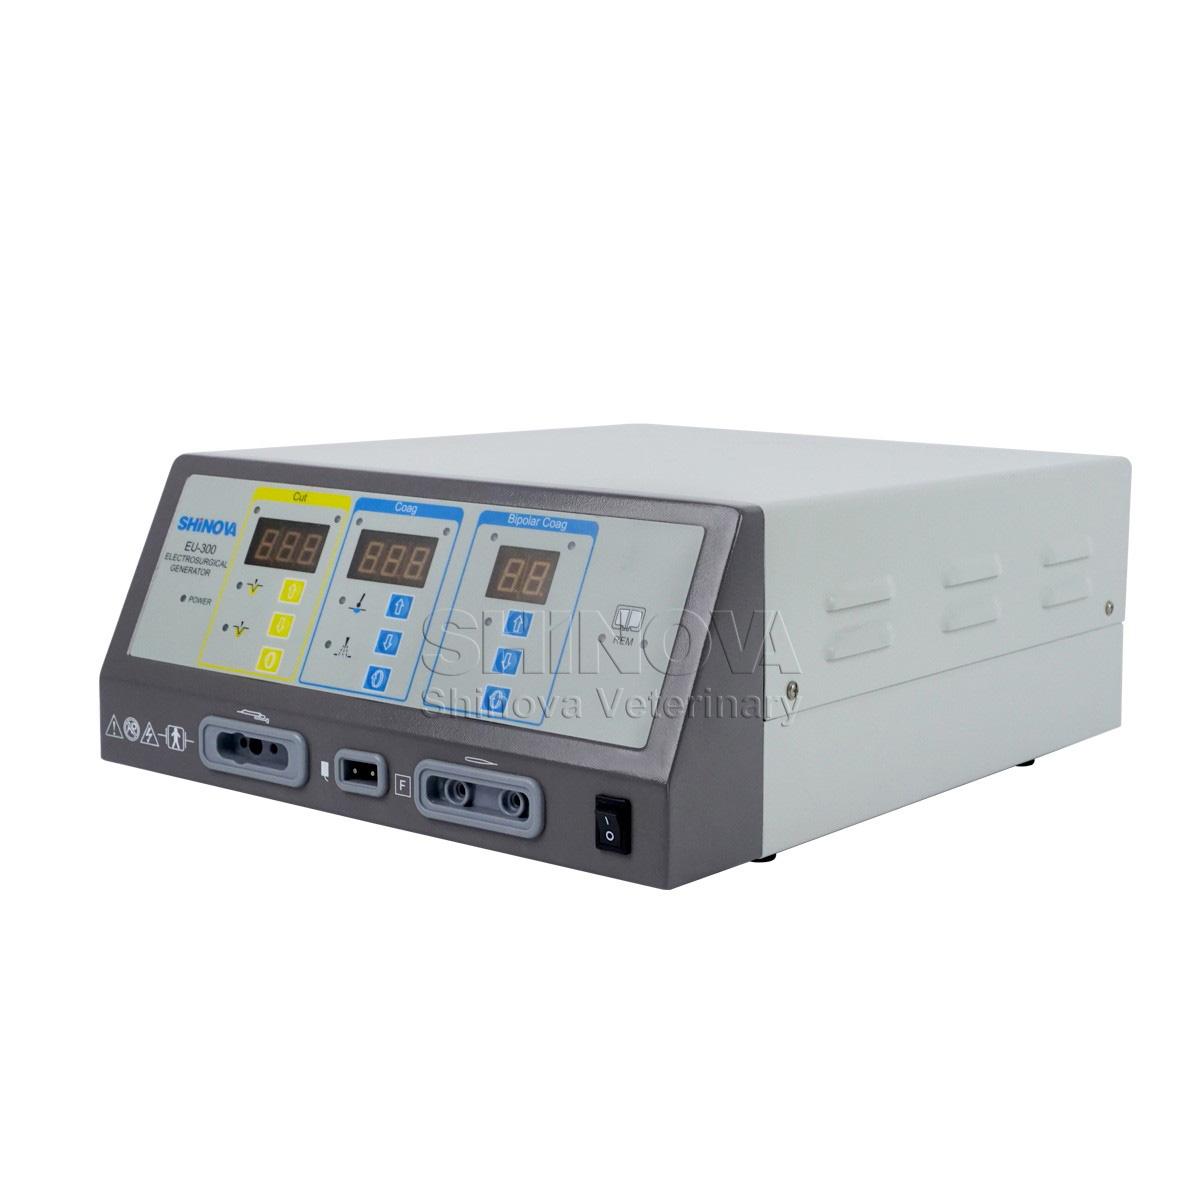 Electrosurgical Unit Shinova Vet Veterinary Ultrasound